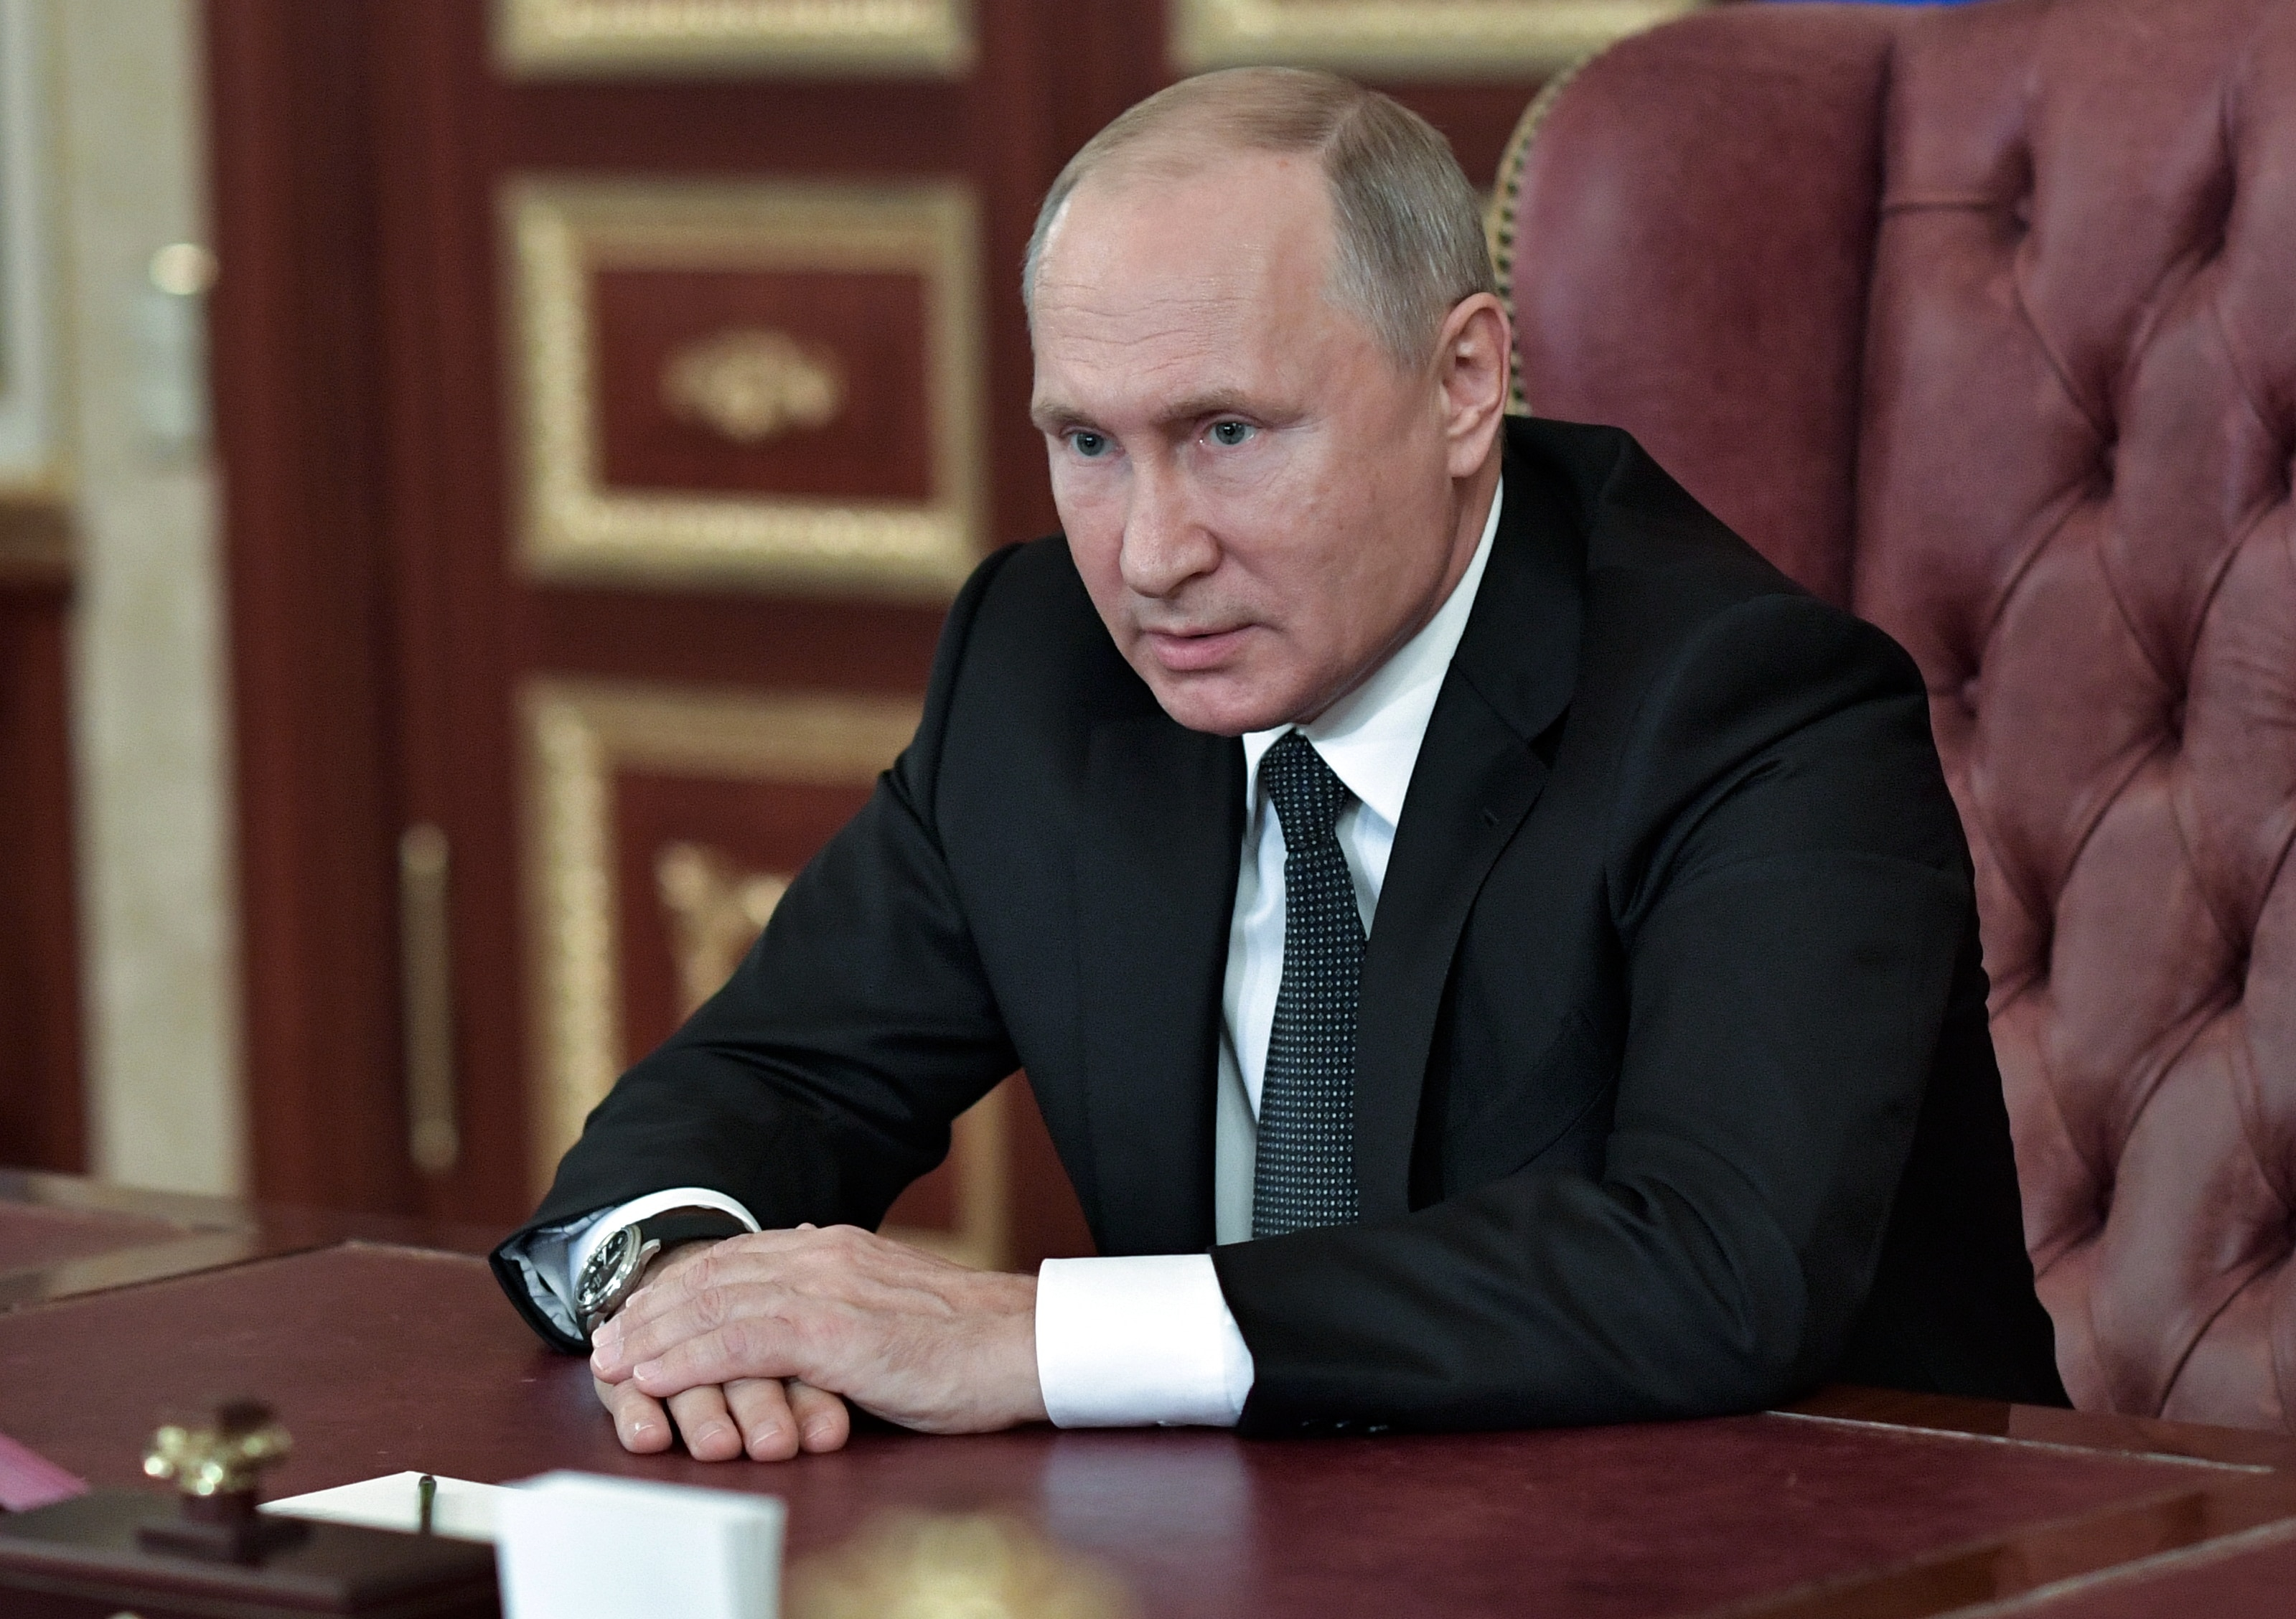 Putin Skripal traditore